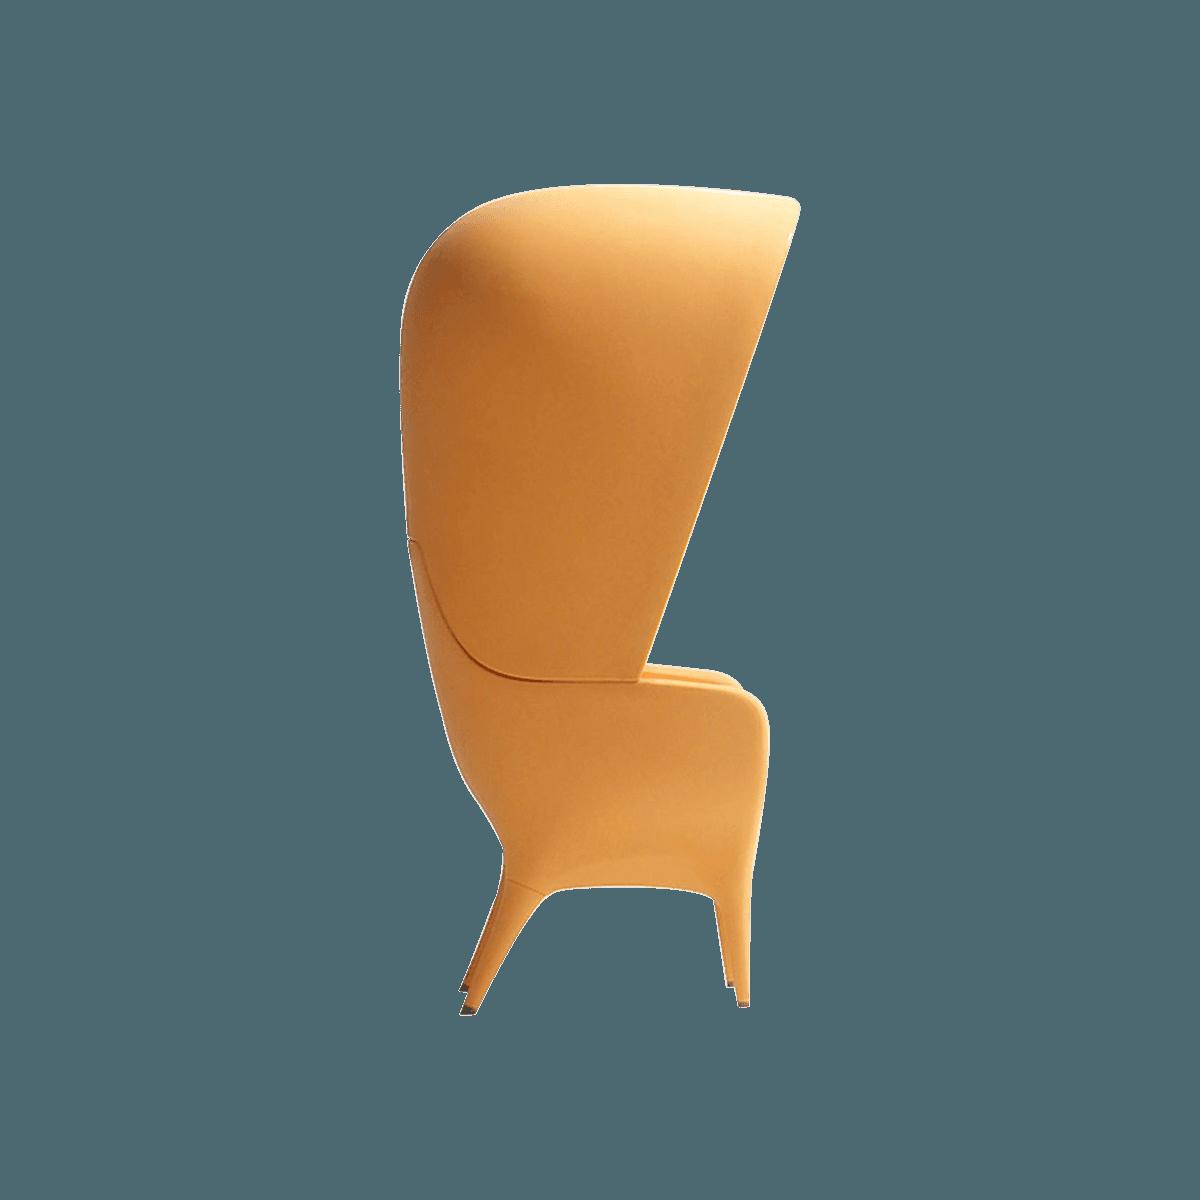 b.d barcelona design  Showtime Poltrona - Outdoor 户外扶手椅